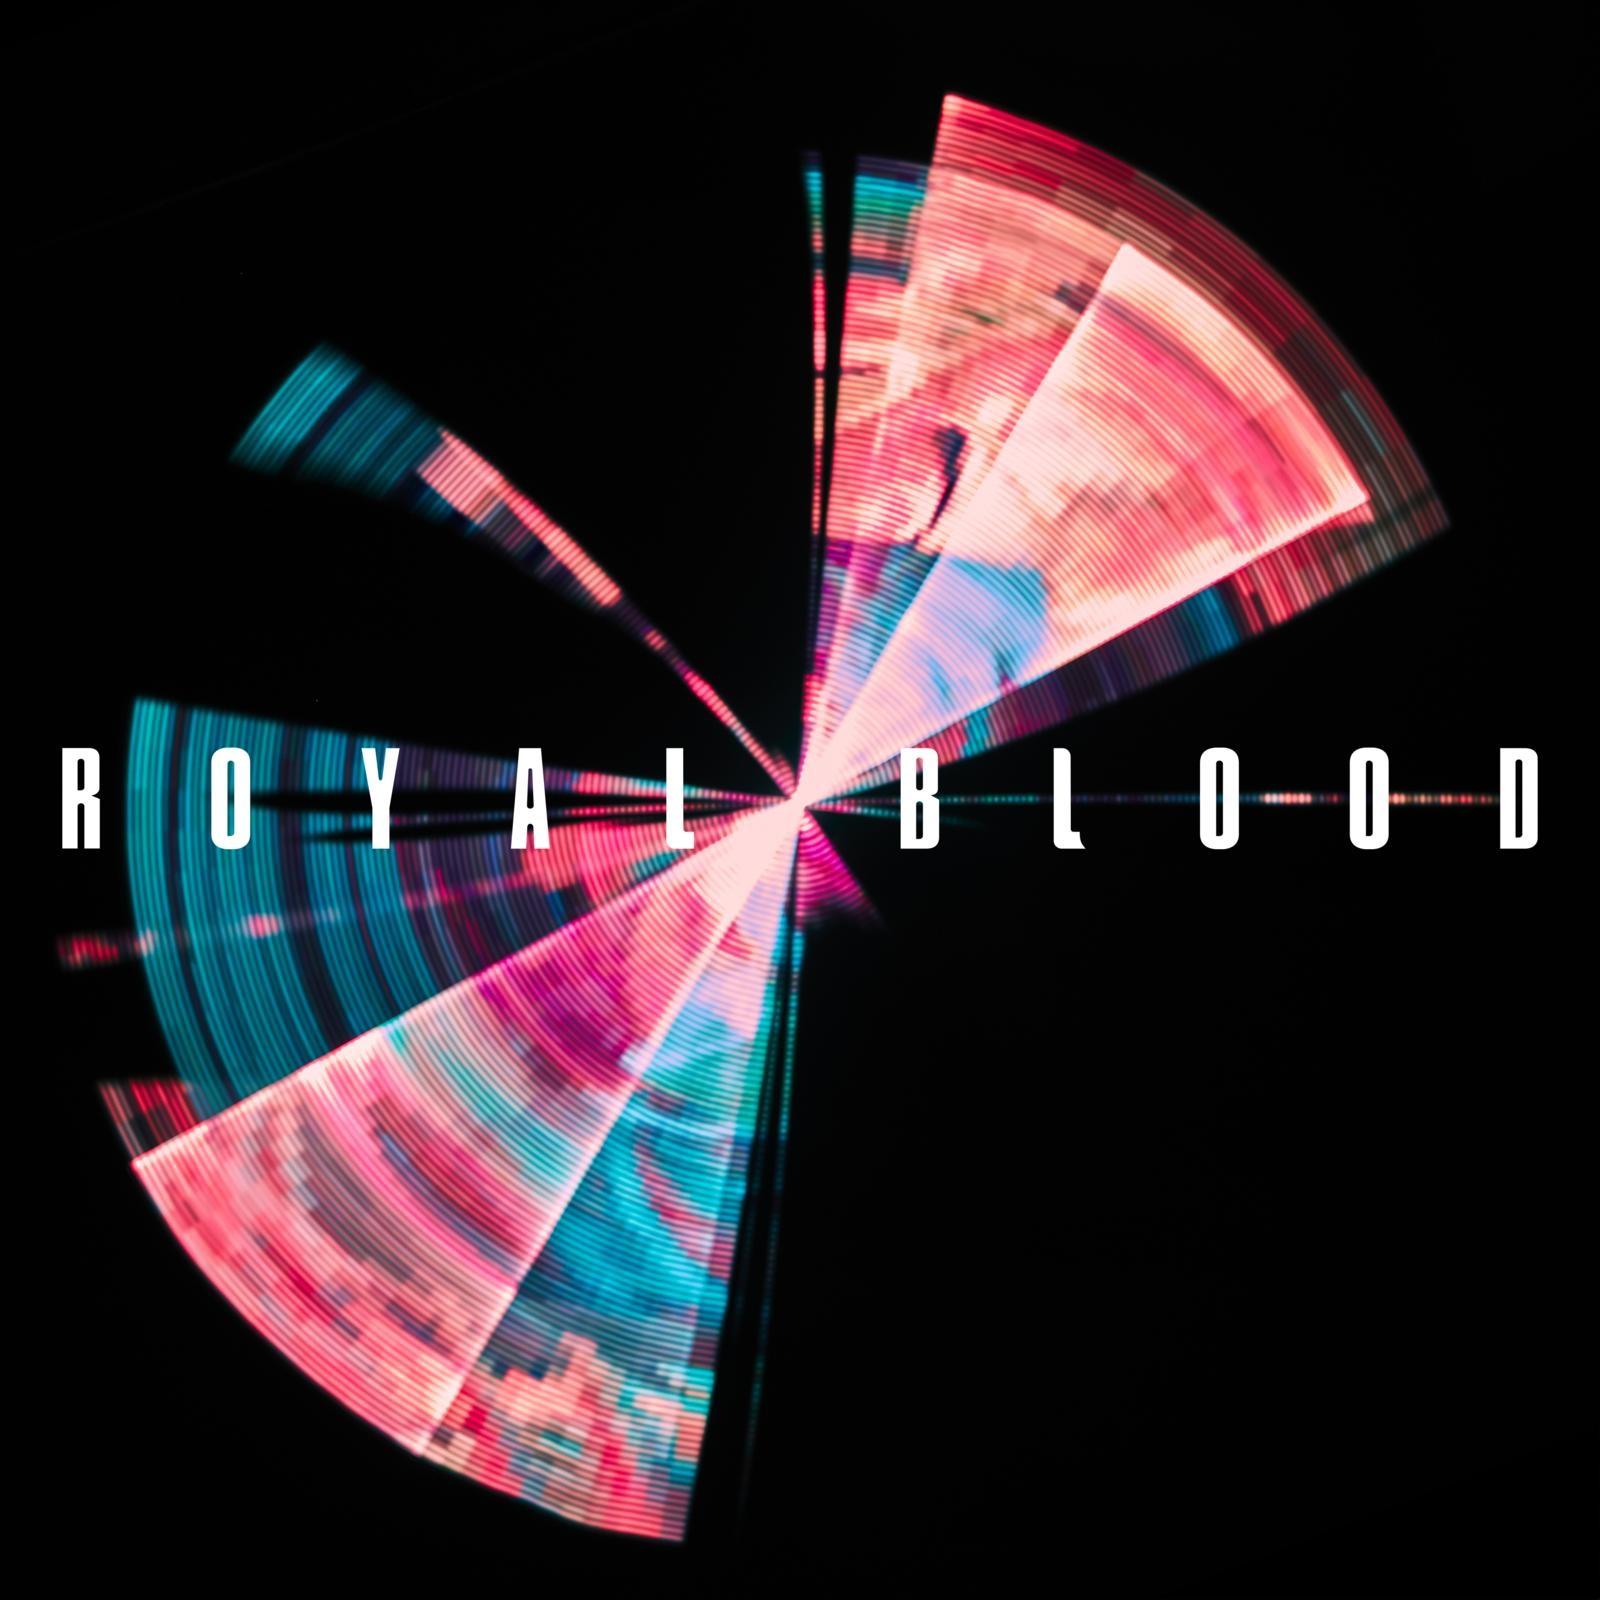 Виниловая пластинка Royal Blood Limbo (Limited Black Vinyl)